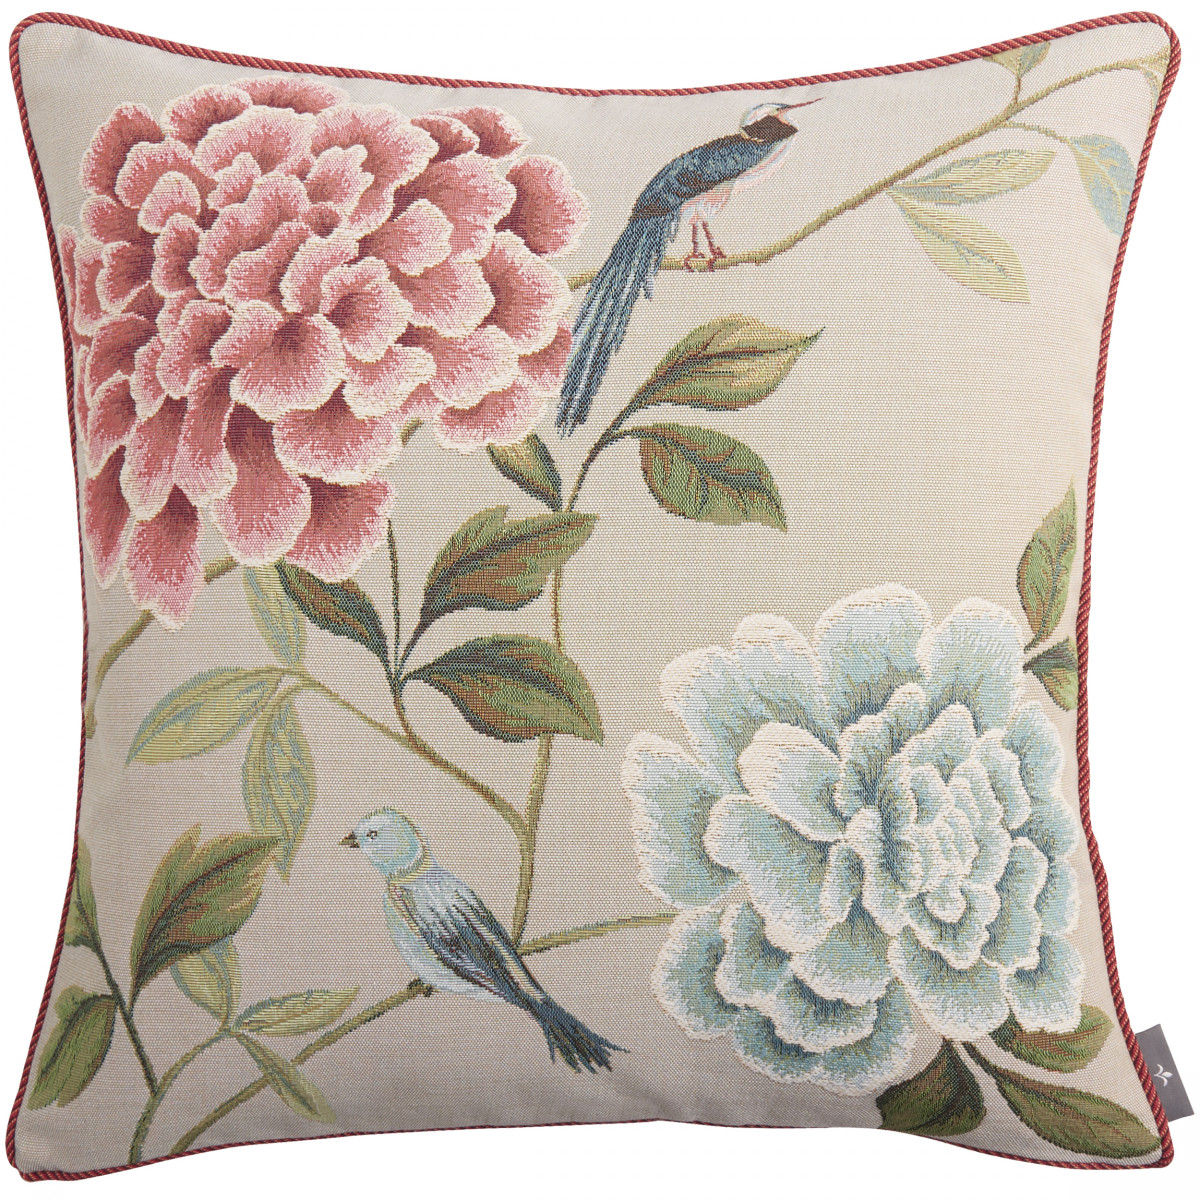 Coussin tapisserie fleurs oiseaux bleus made in france gris   50x50